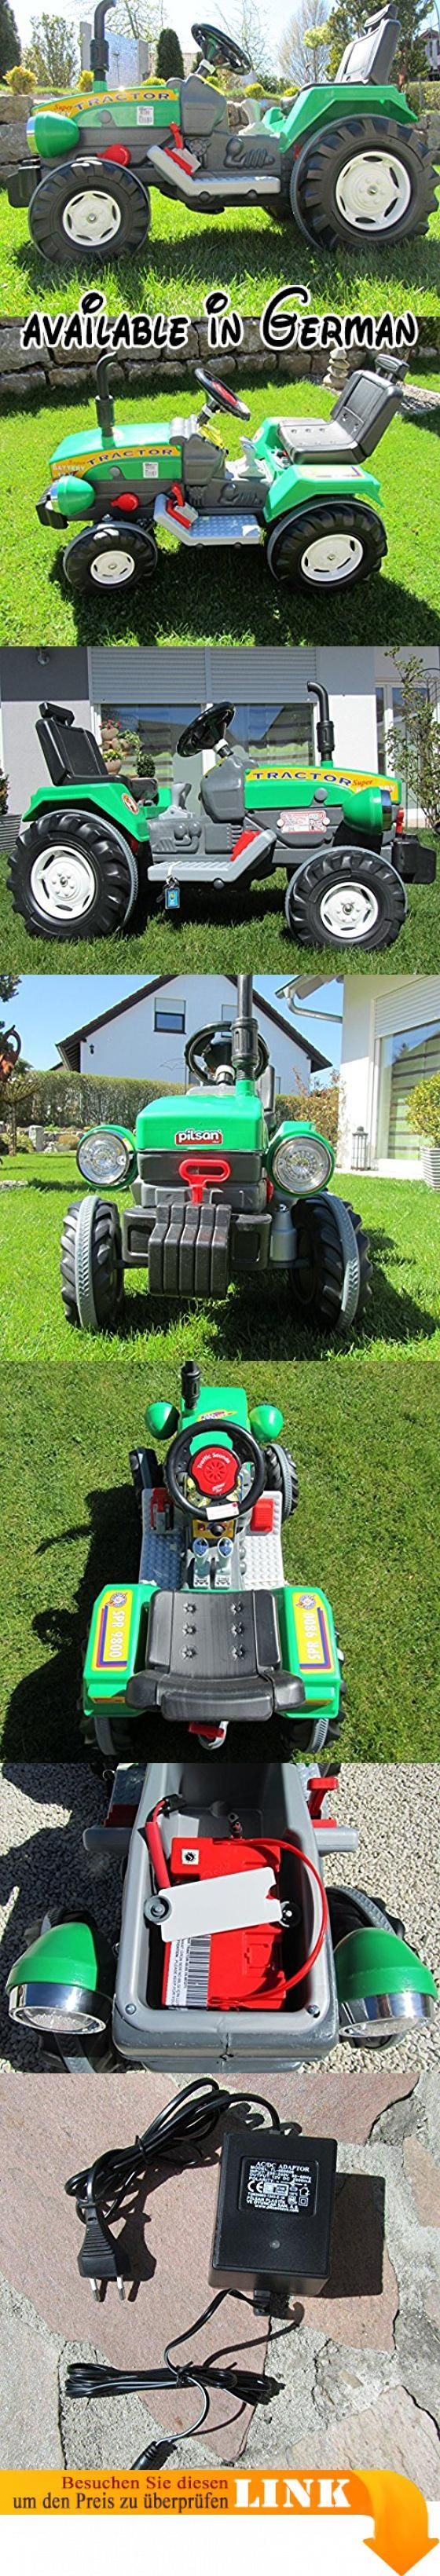 "Super Traktor mit 2 Motoren je 12V Traktor Fahrzeug""Top Qualität"" 05210. Kindertraktor. Traktor. Elektro Traktor. Schlepper. Maße: 102 x 55 x 66 cm #Sports #SPORTING_GOODS"